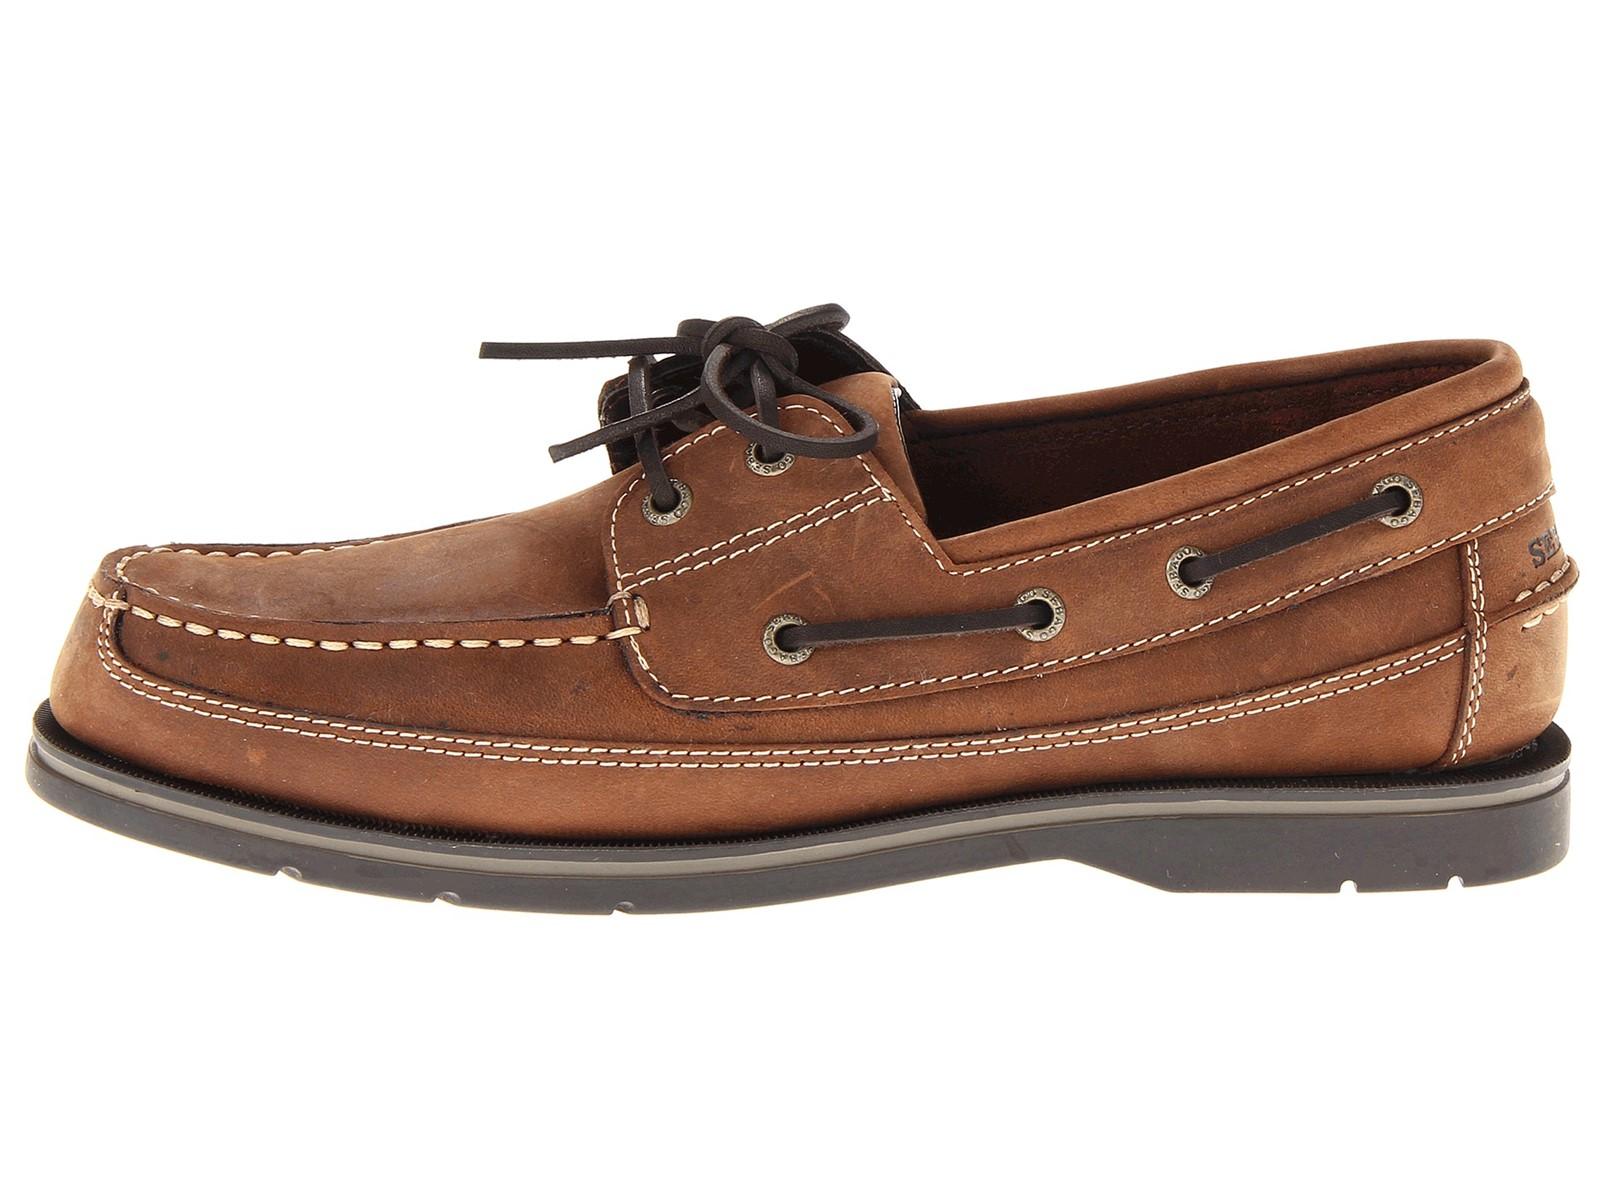 Sebago Shoes Size In Cm